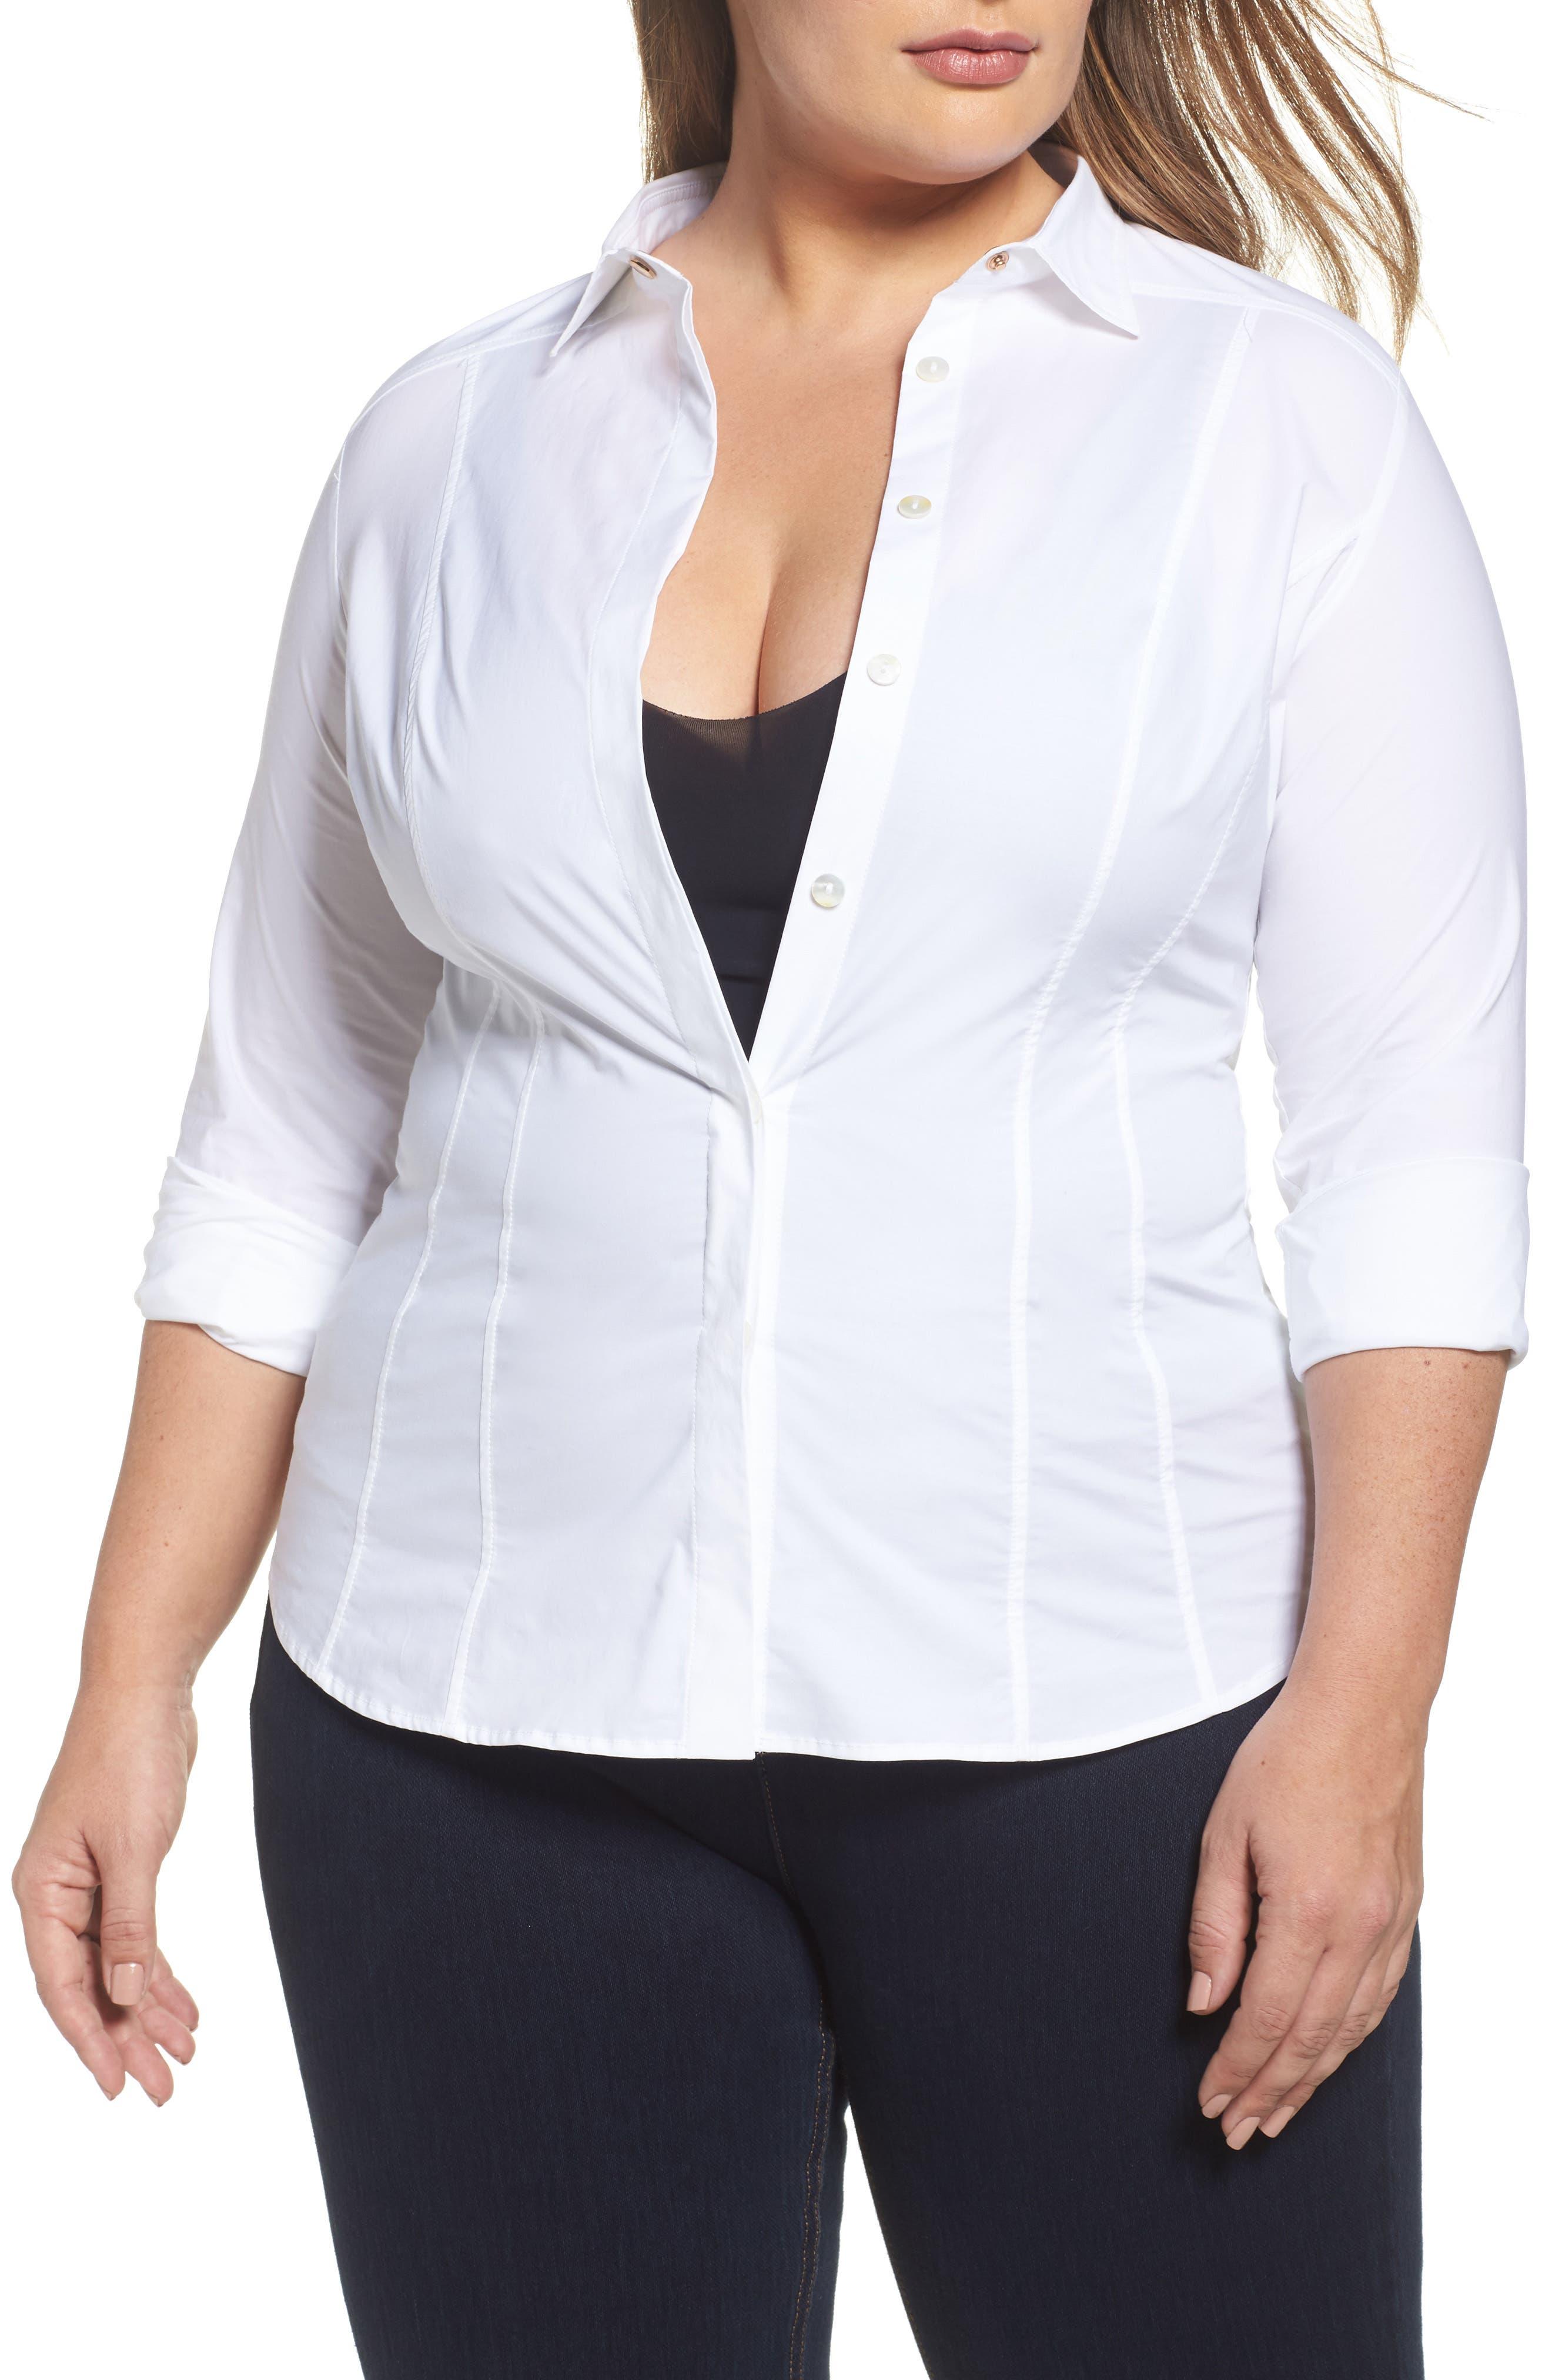 Ashley Graham x Marina Rinaldi Beauty Poplin Button Down Shirt (Regular & Plus Size)